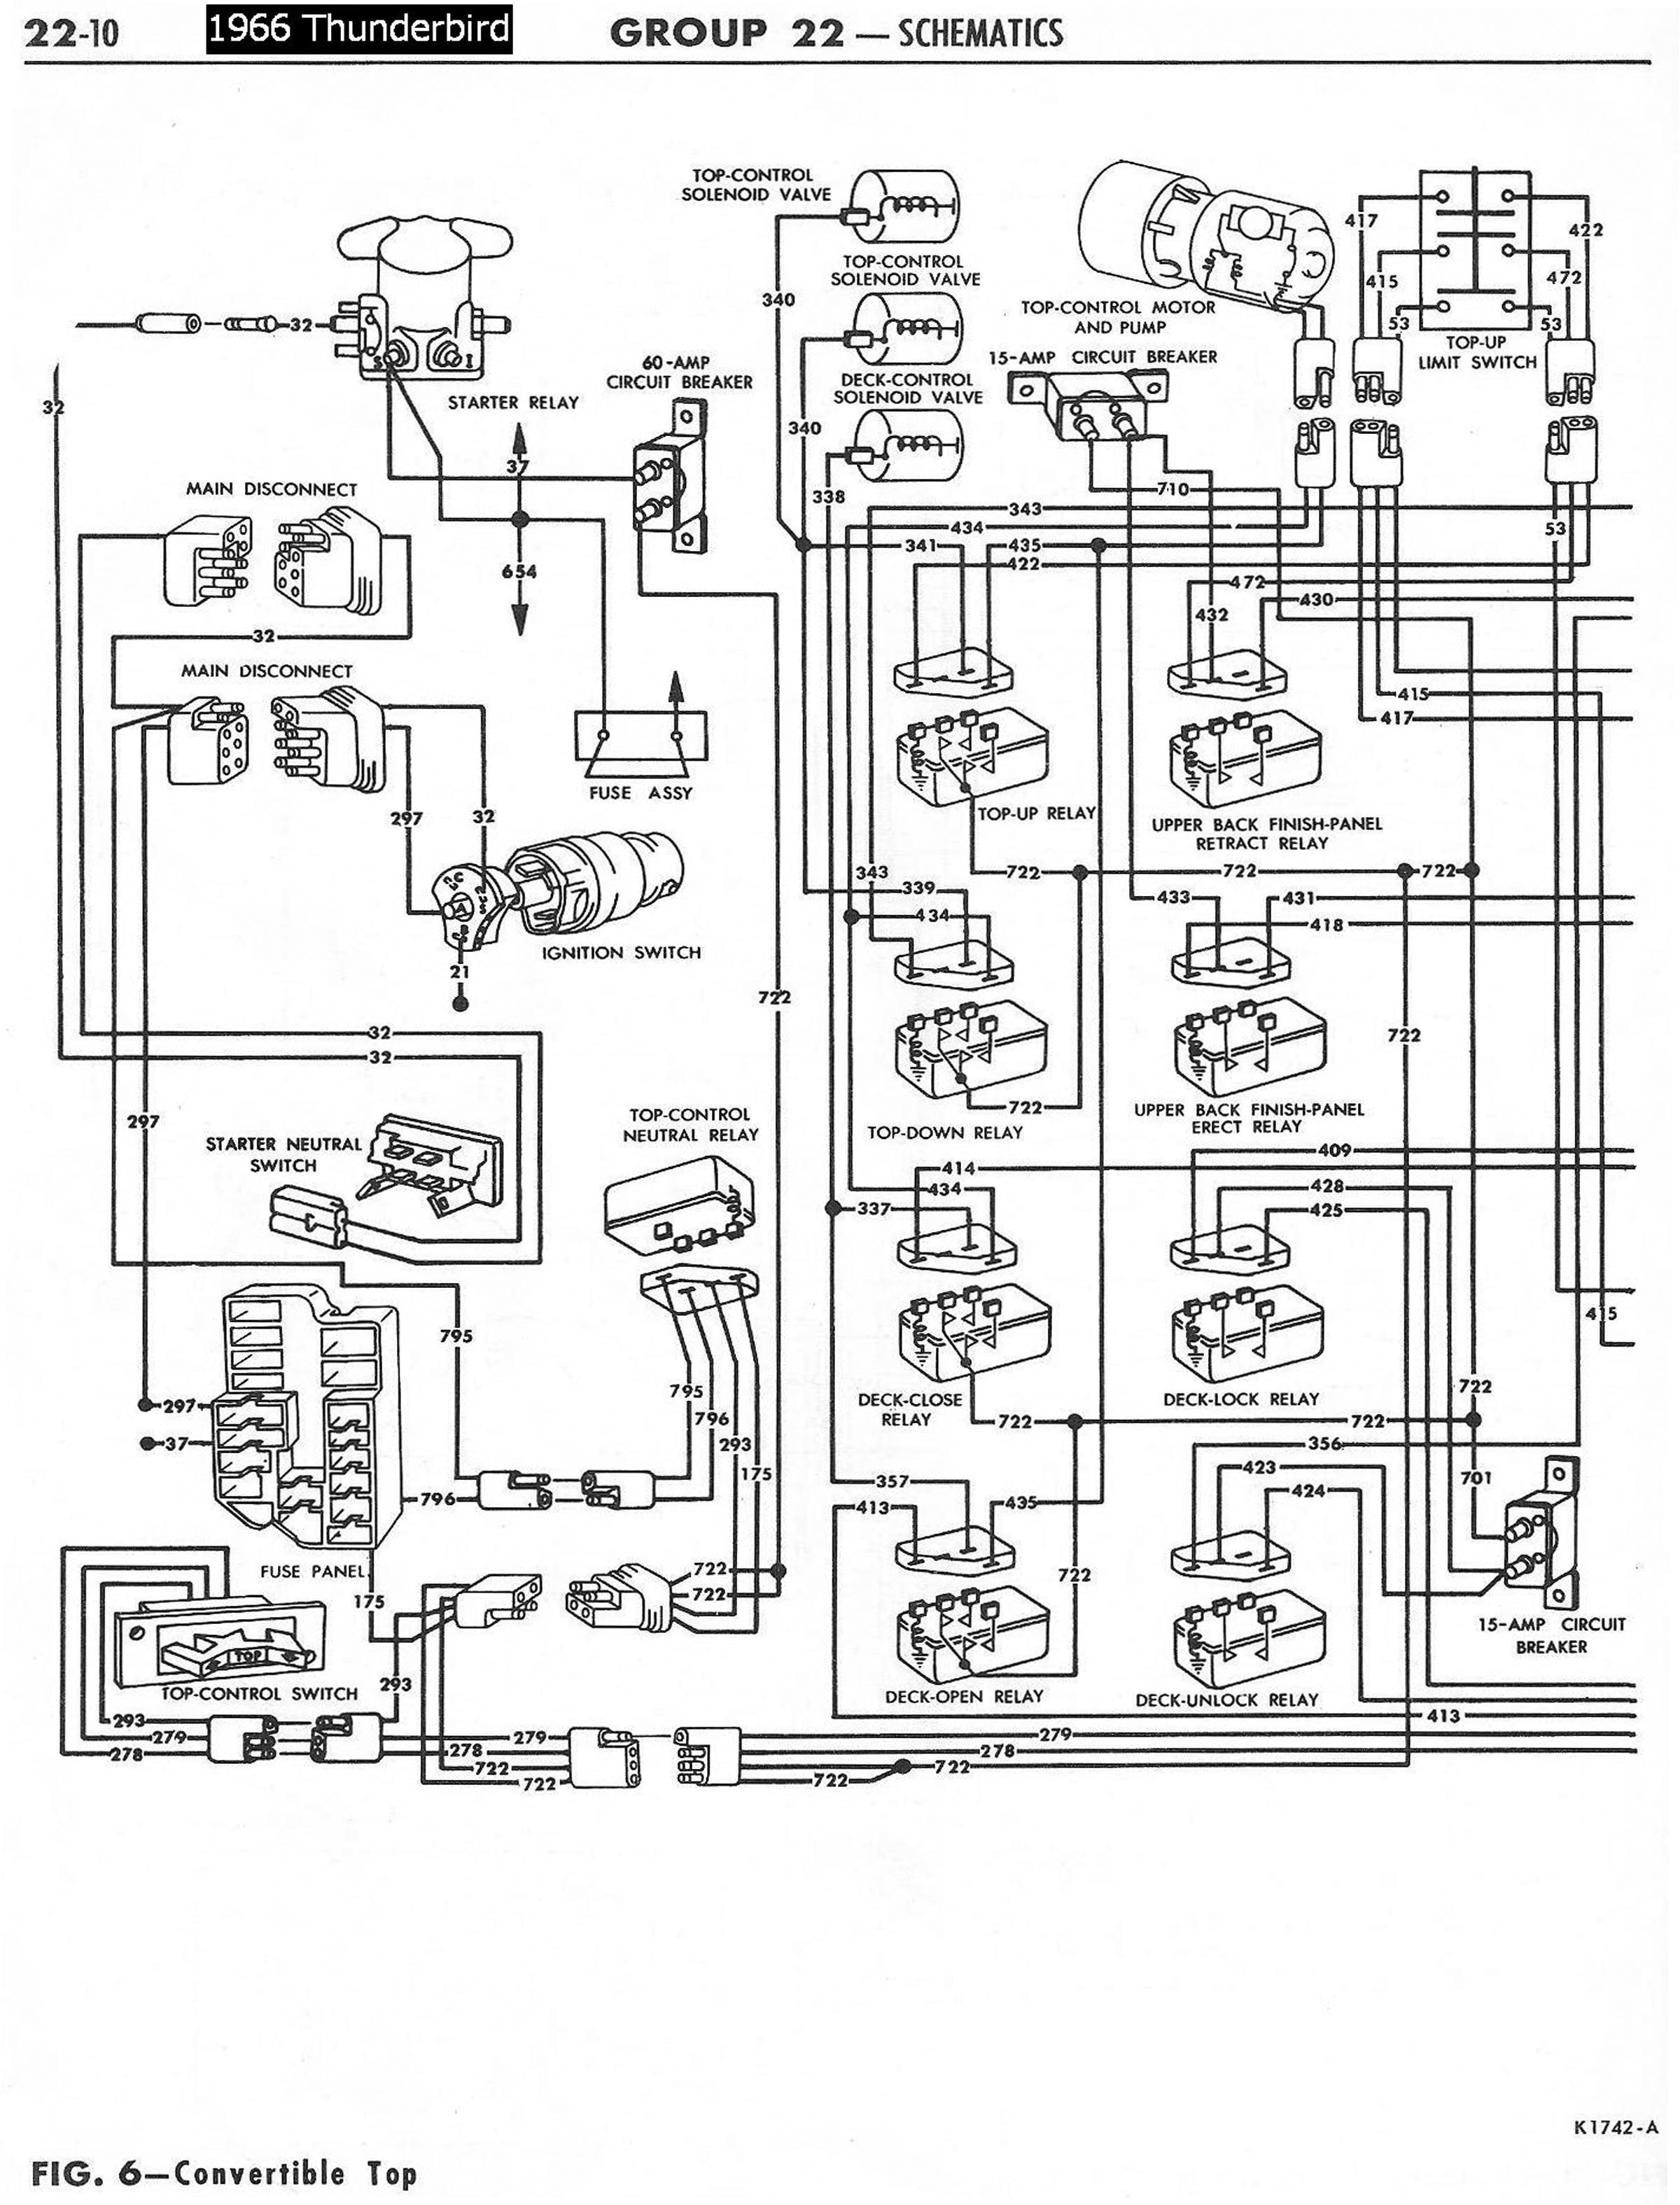 1966 ford thunderbird convertible top wiring diagram